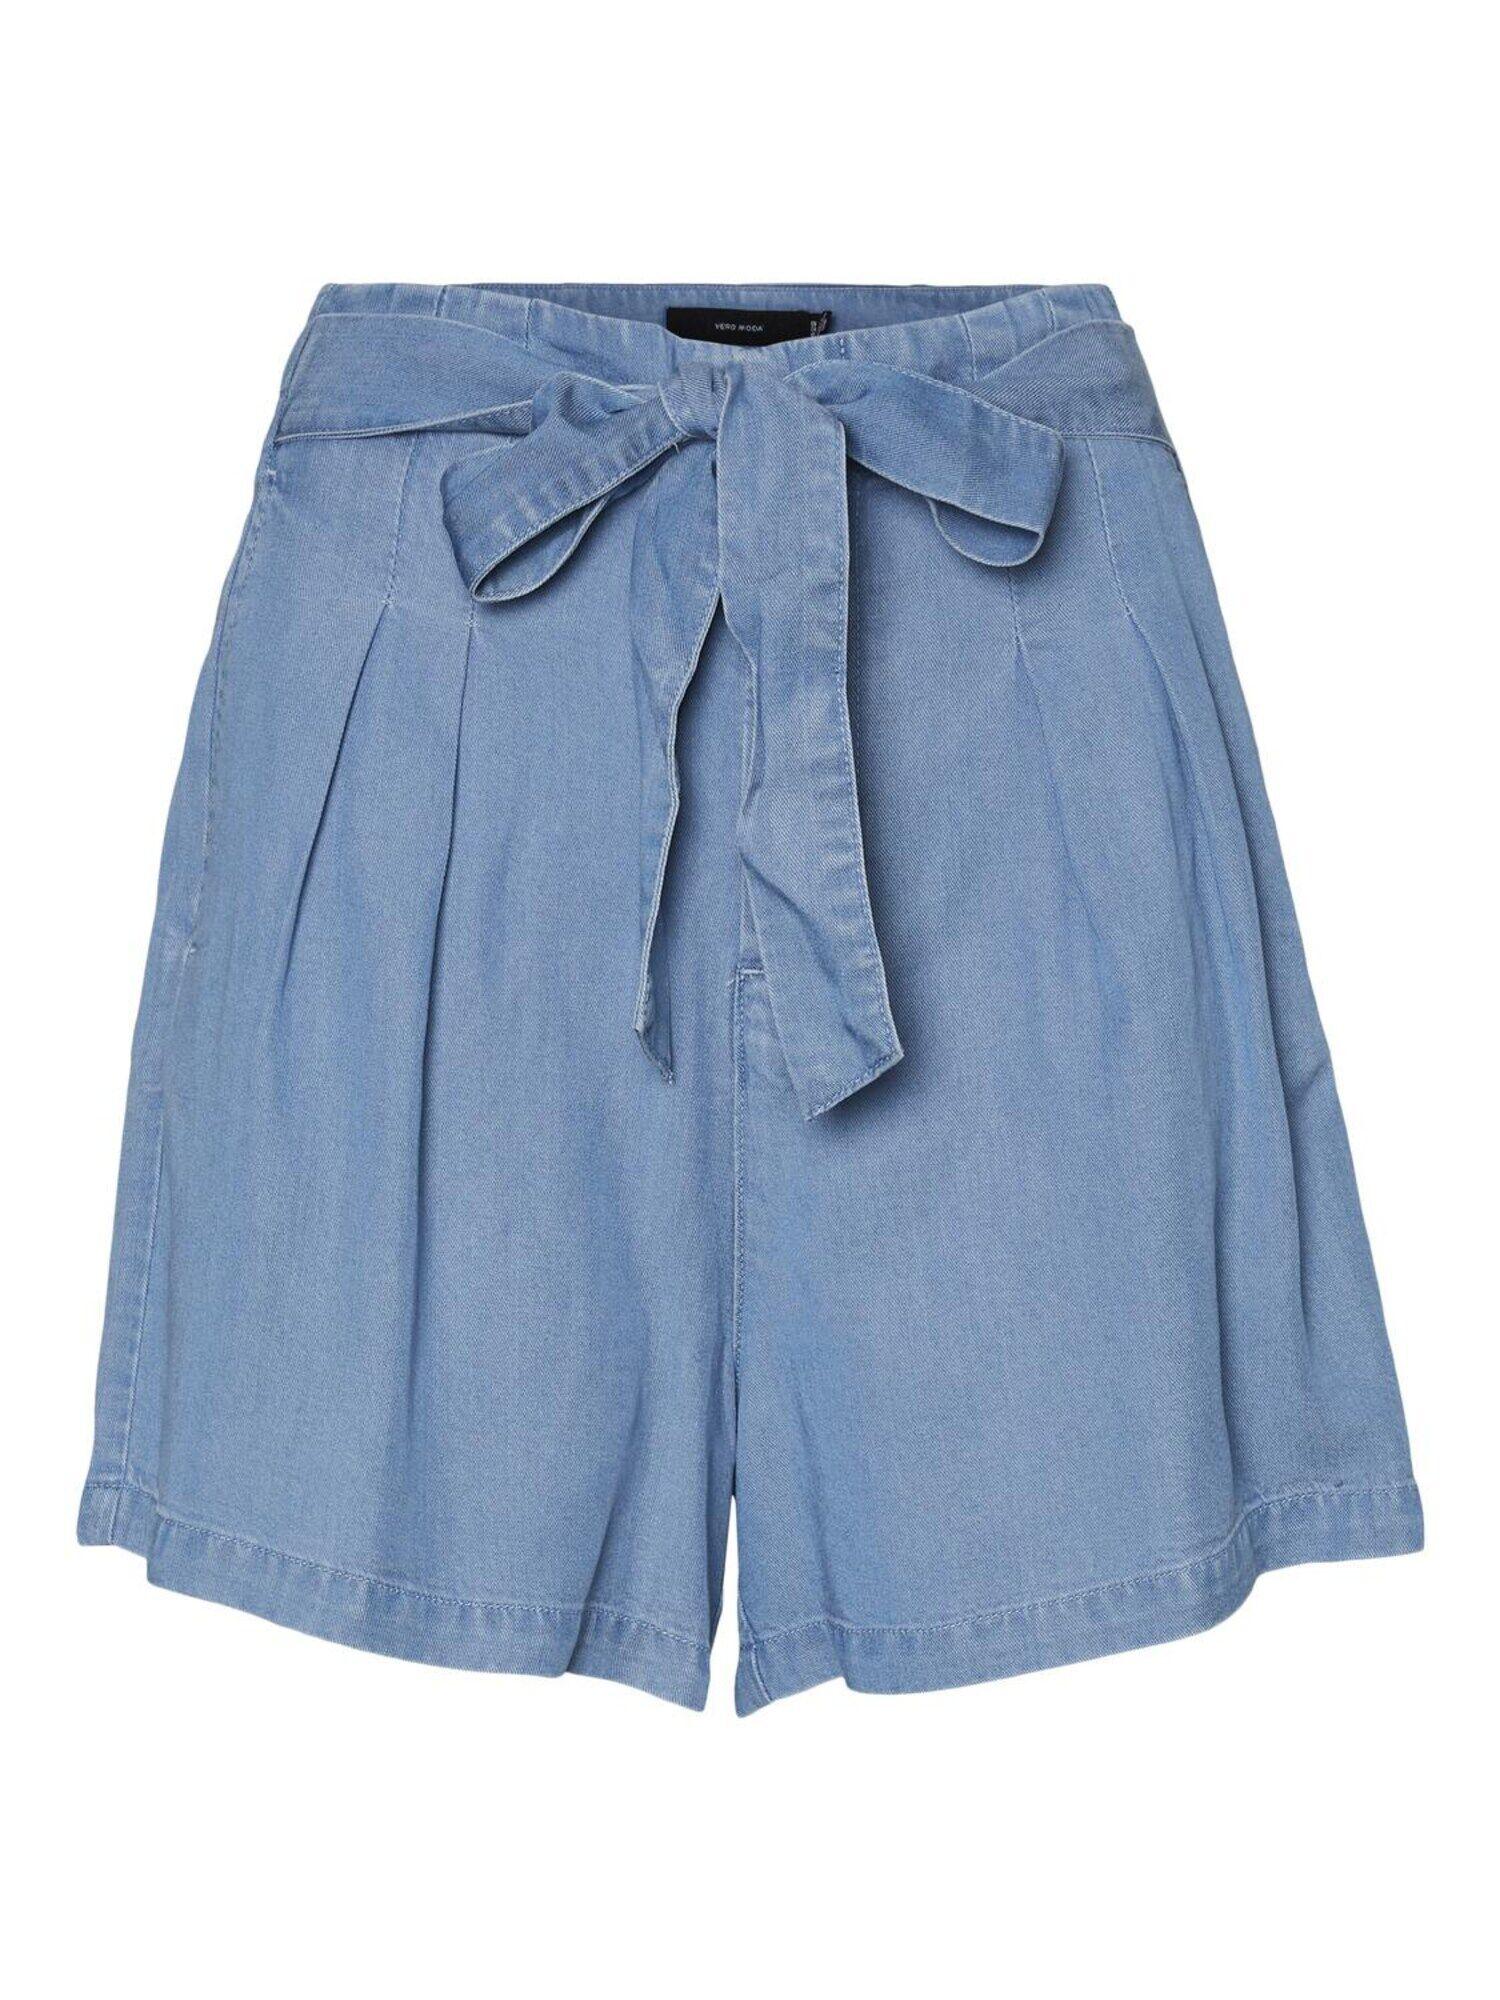 Vero Moda Curve Pantalon à pince 'MIA'  - Bleu - Taille: 52 - female